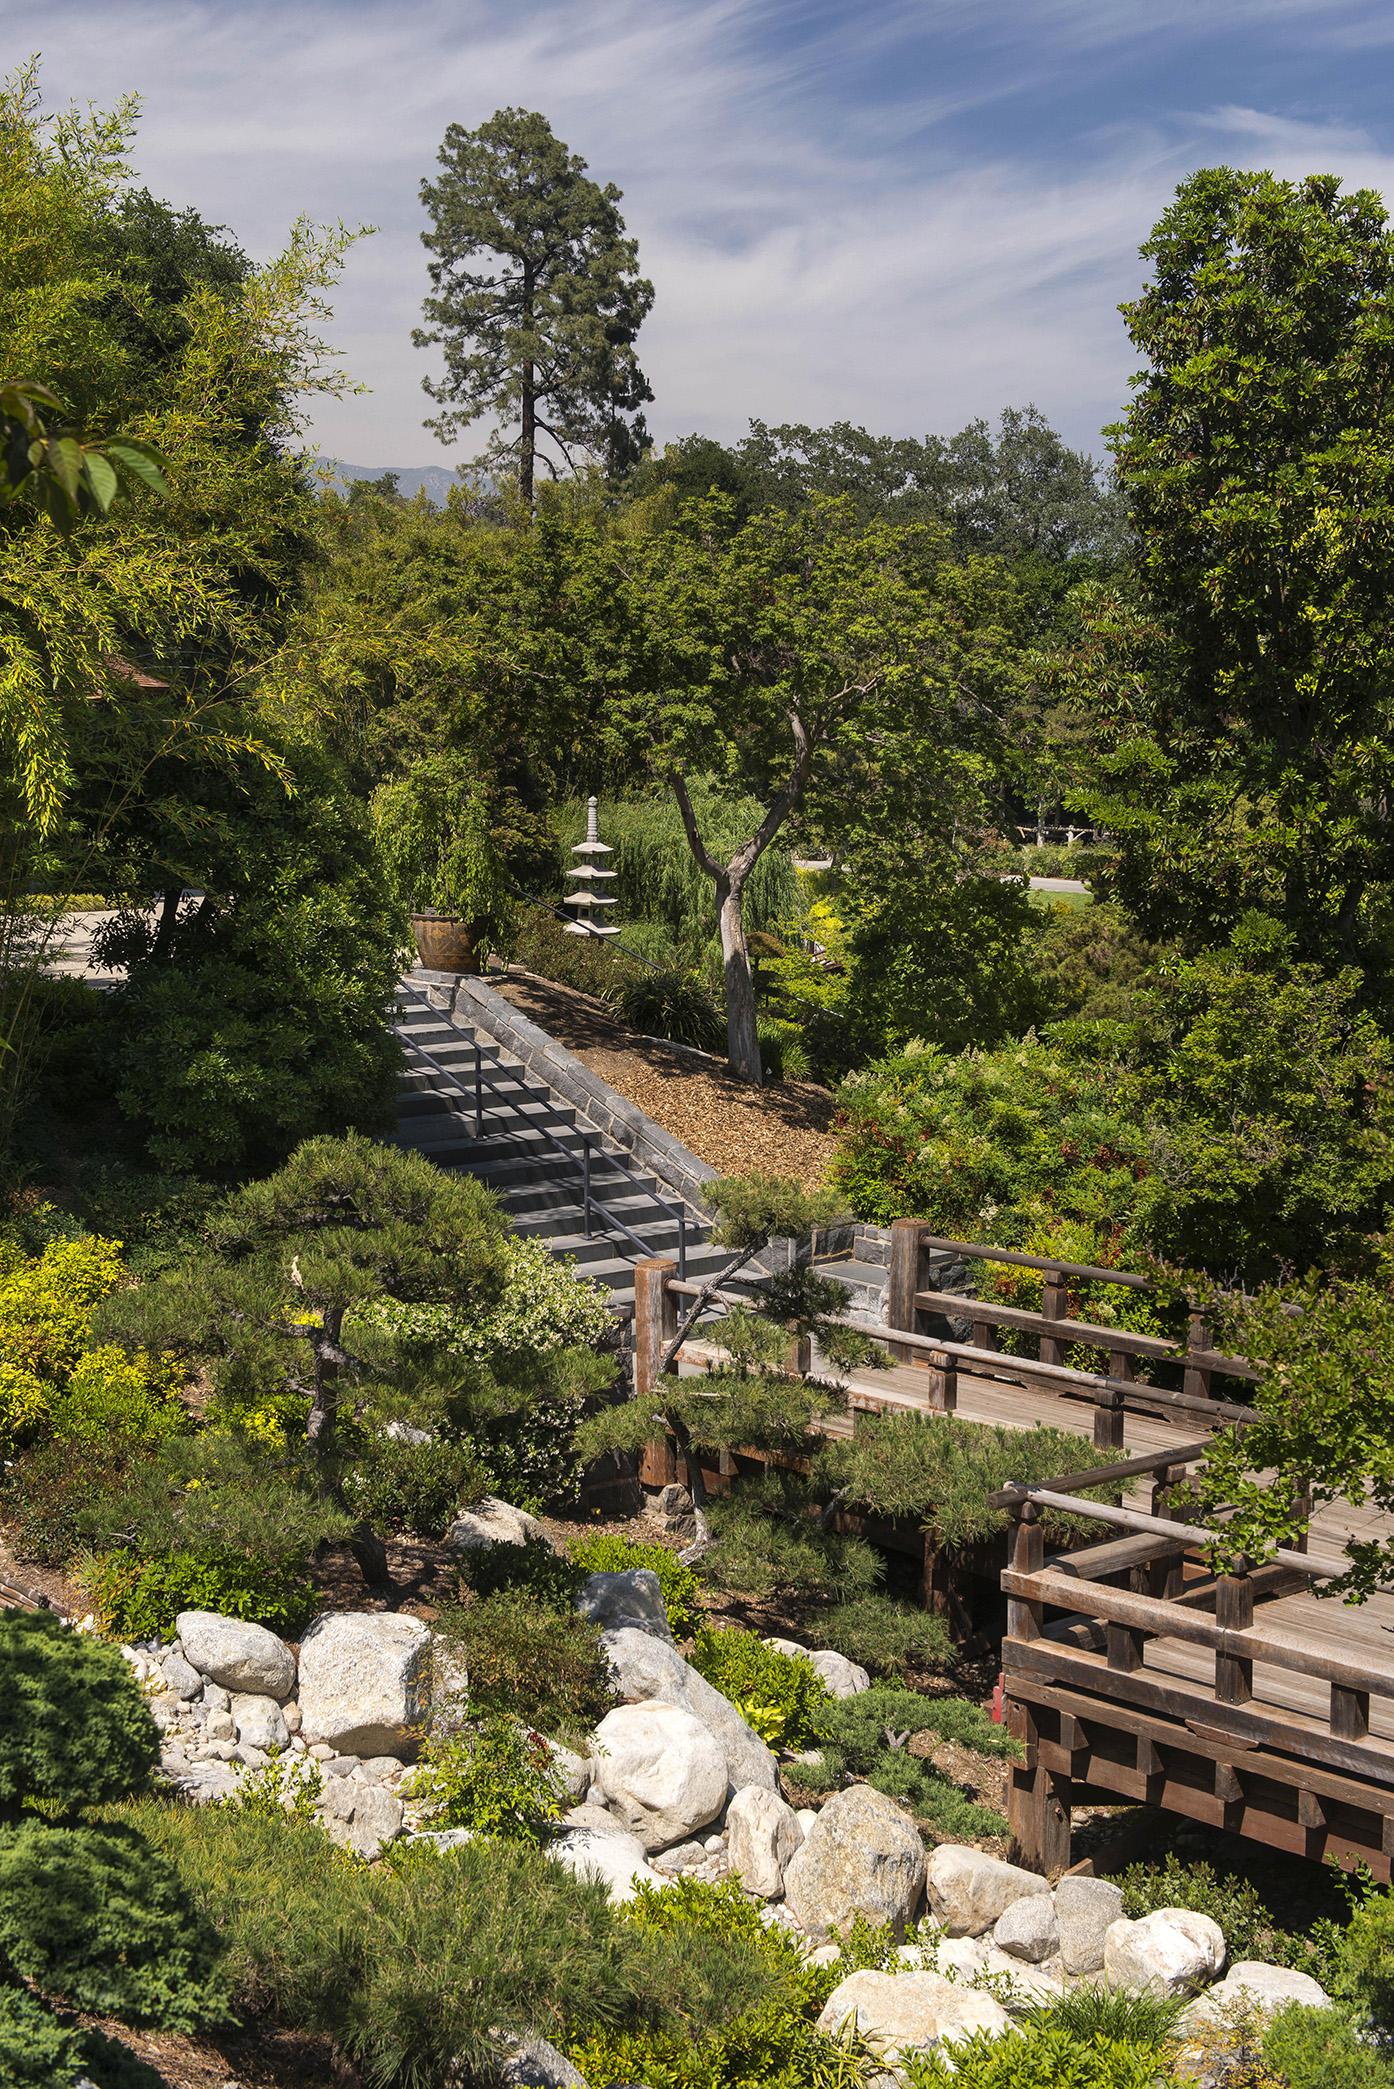 Japanese Gardens At The Huntington Library